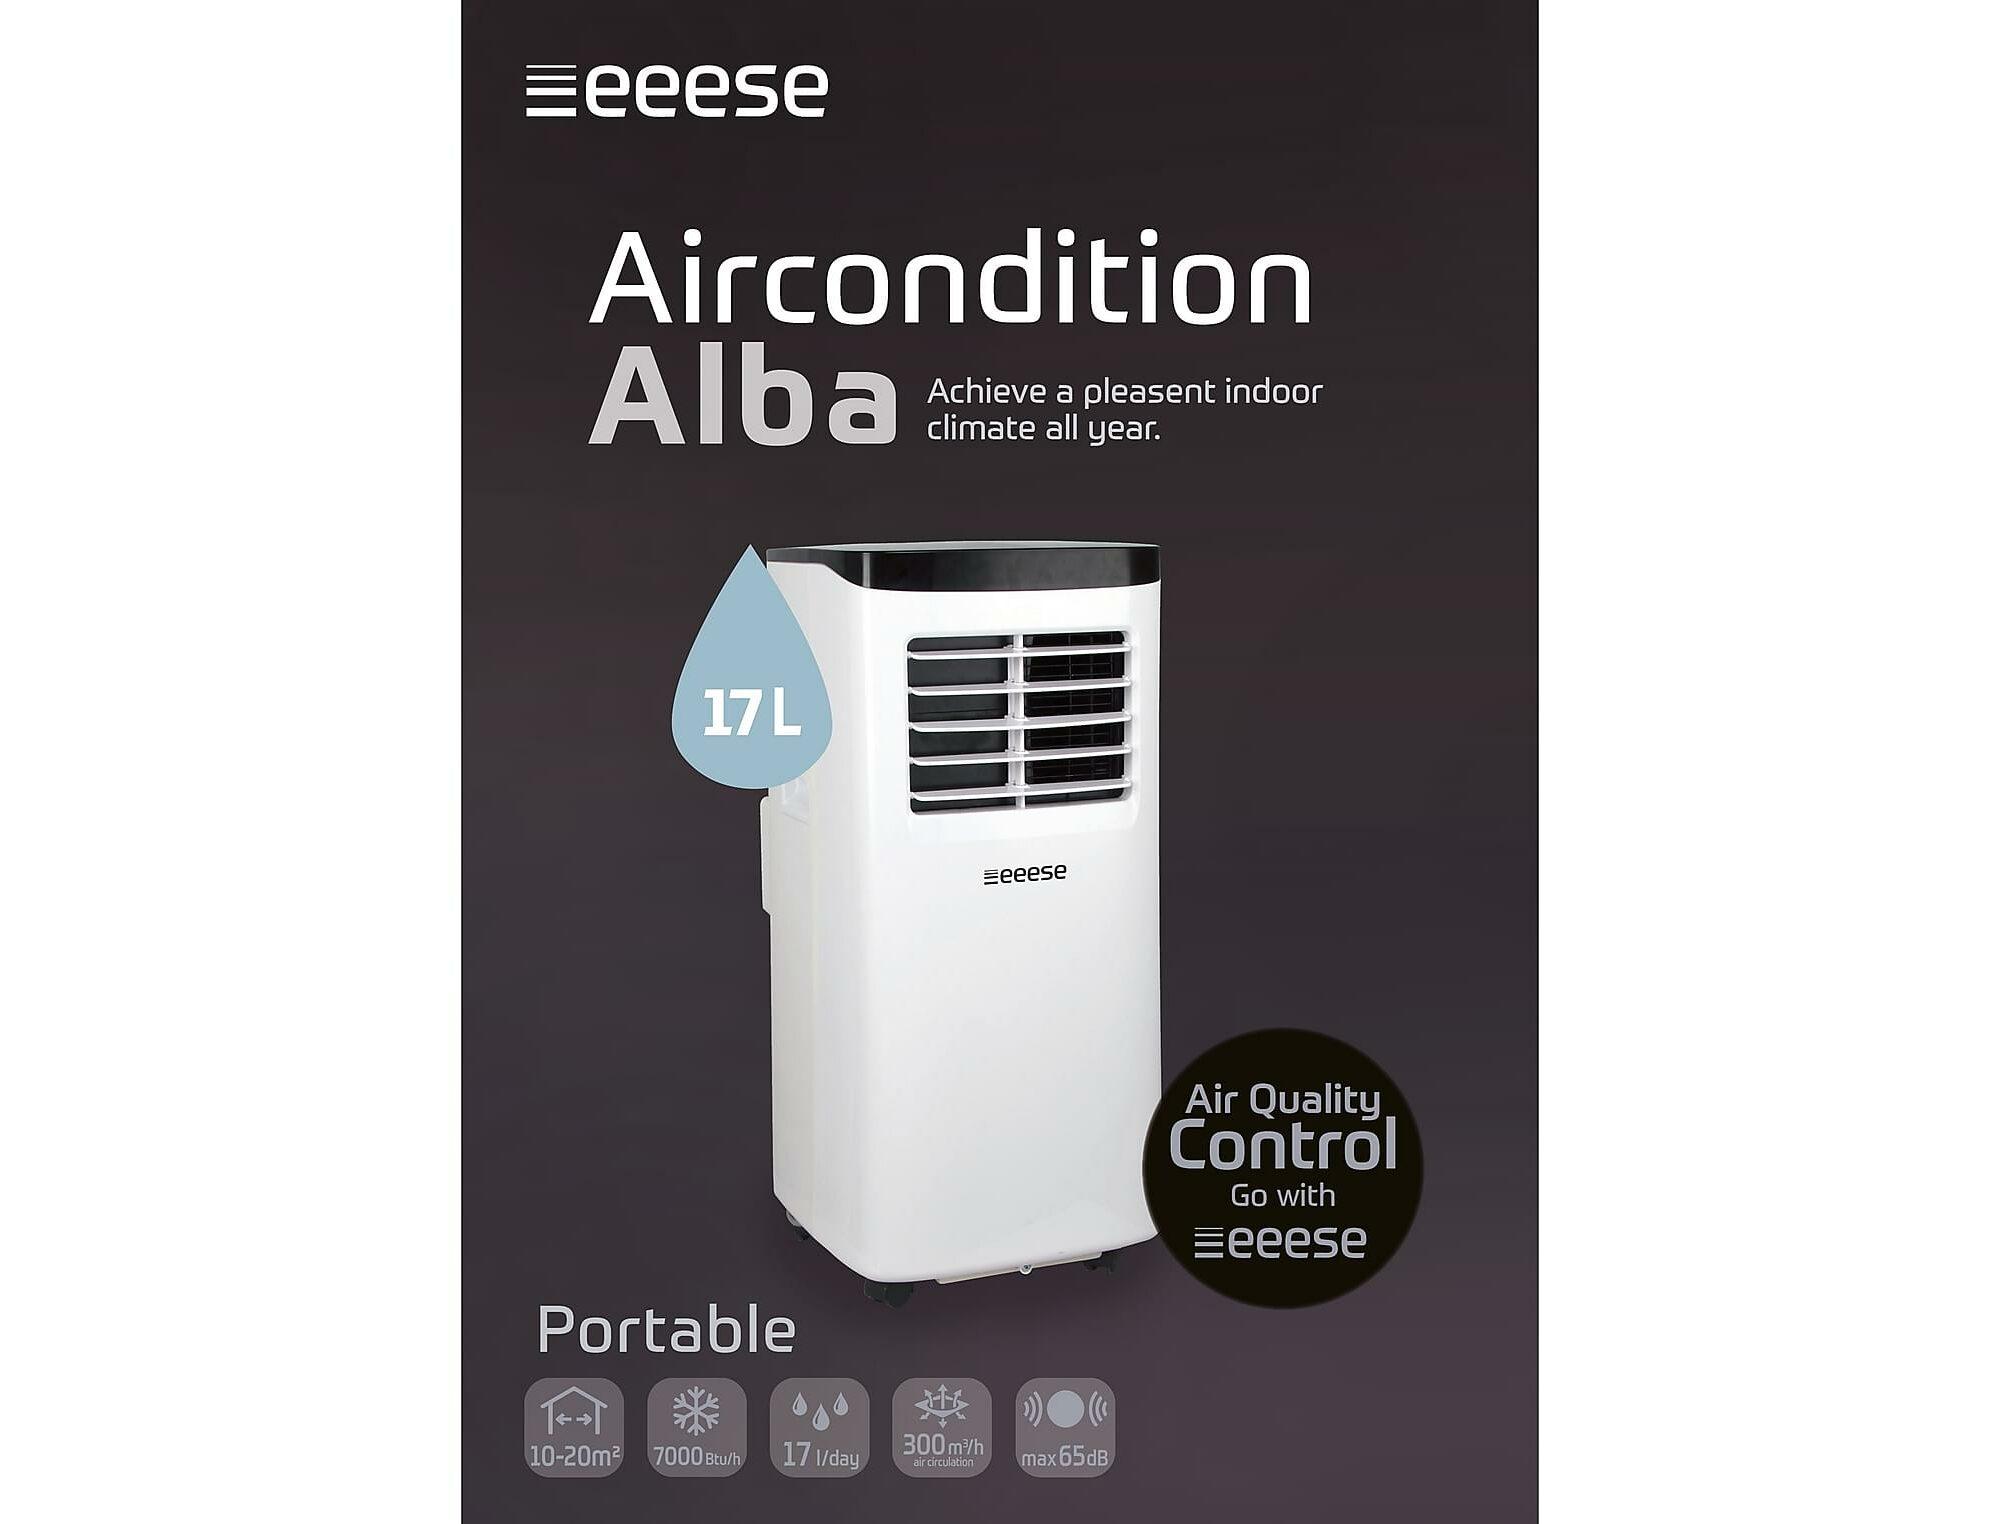 Aircondition Alba 7000 Eeese